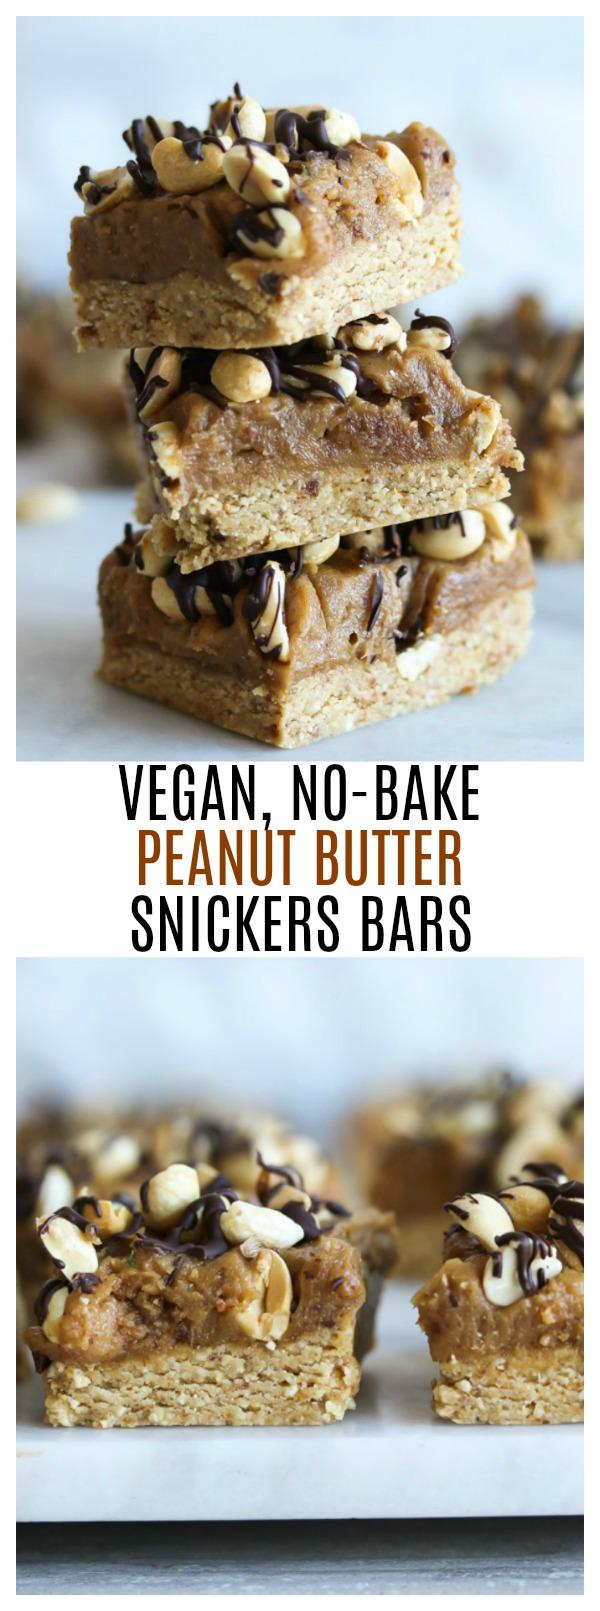 Vegan No-Bake Peanut Butter Snickers Bars